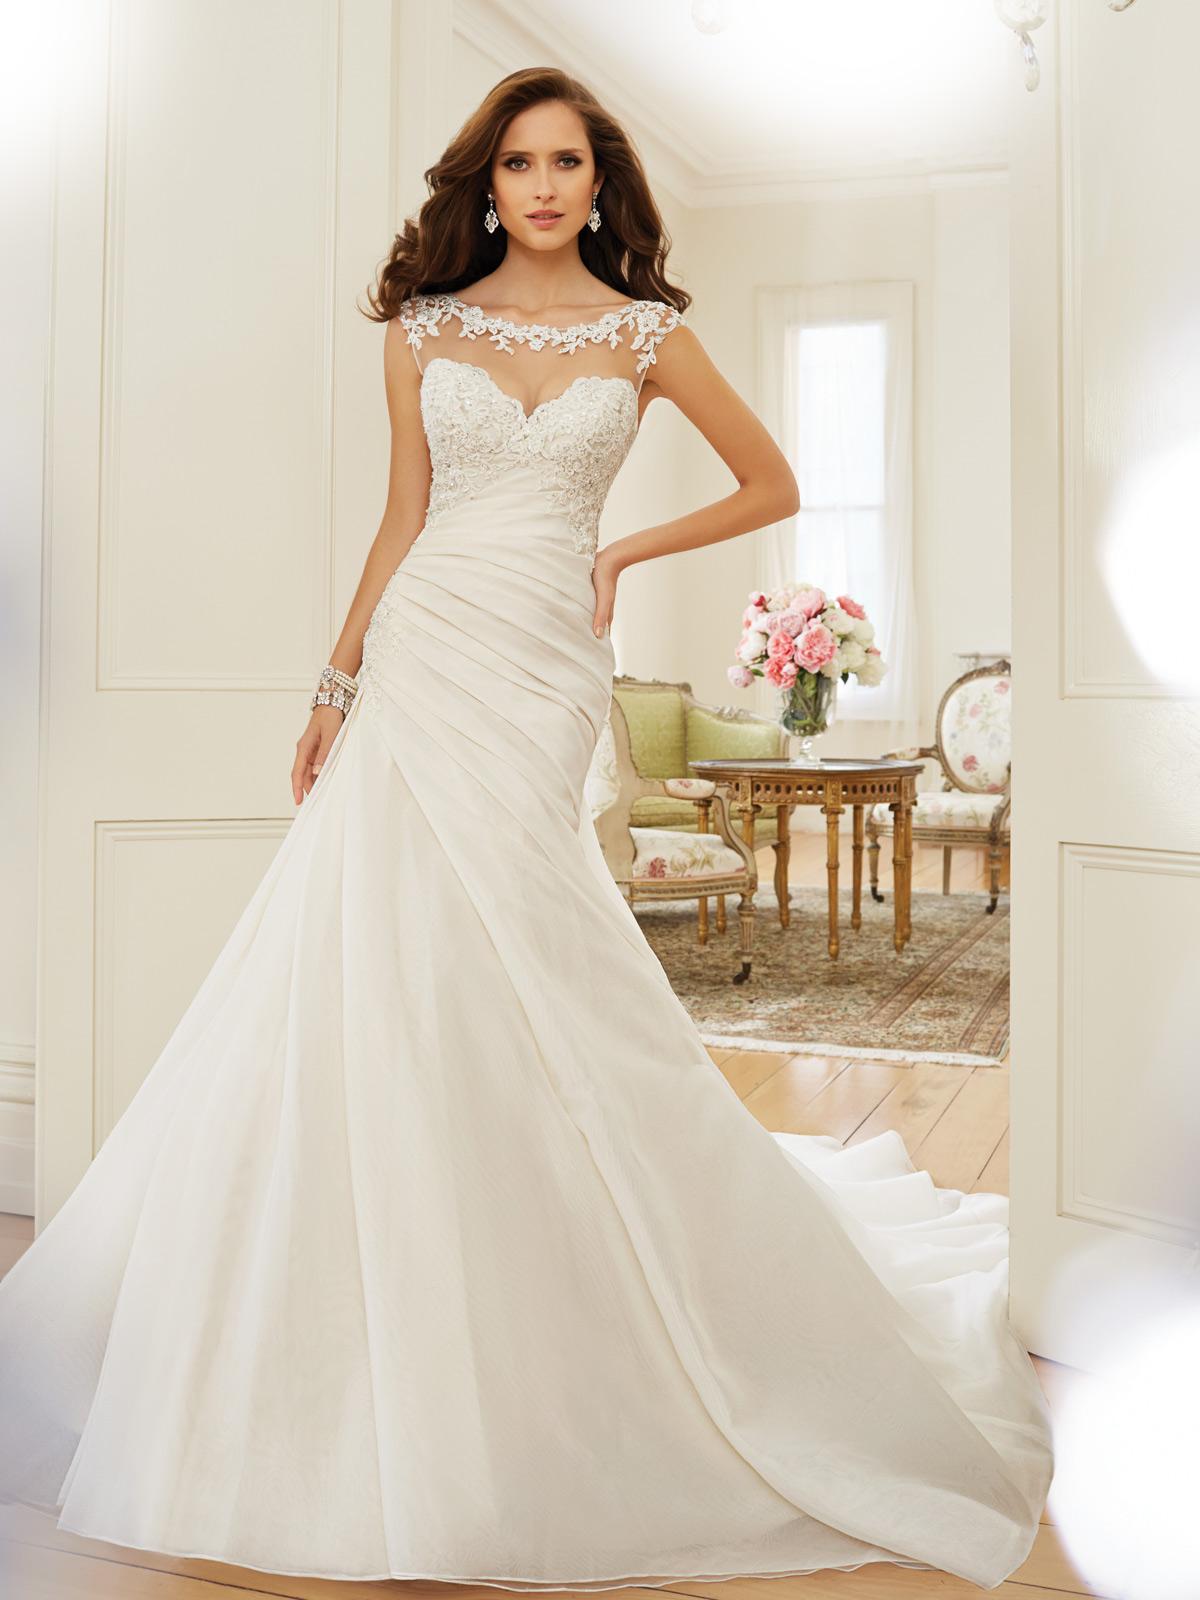 designer wedding gowns lovable designer bridal dresses 17 best images about bridal art collection  2015 on pinterest AYGOQYL